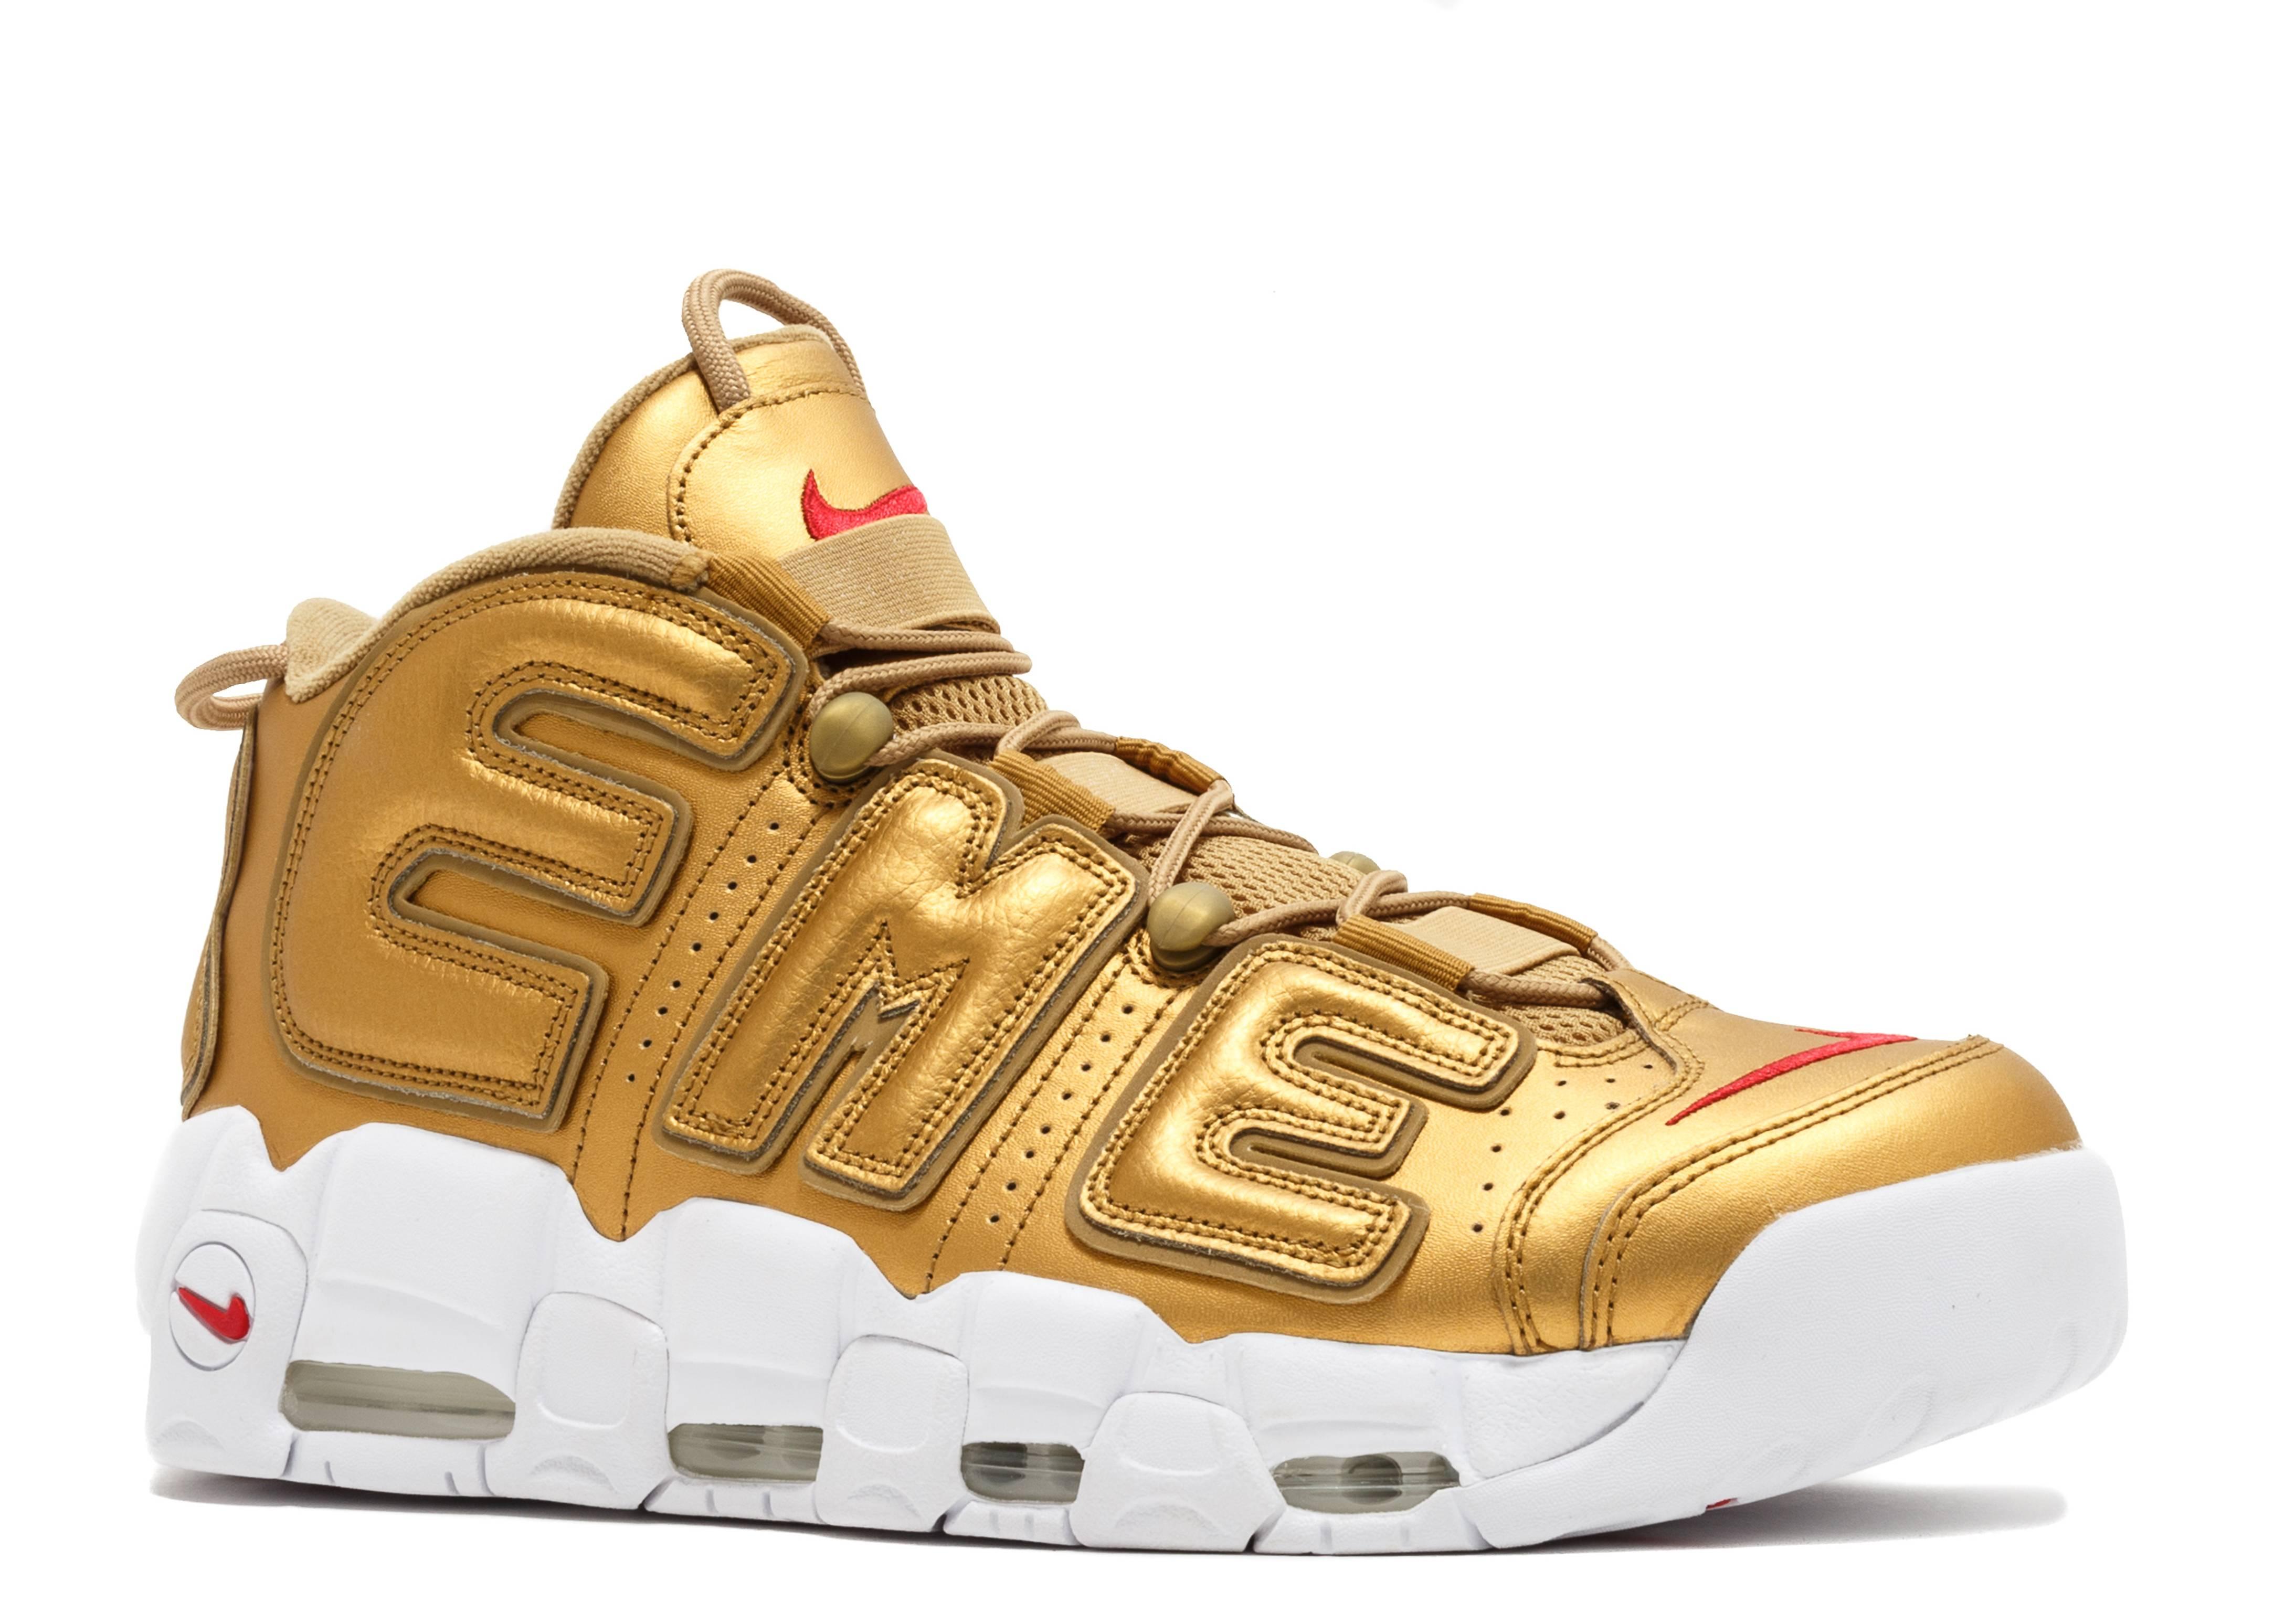 buy popular 8bfef 2da6f Nike Air More Uptempo Supreme Suptempo Gold - 2